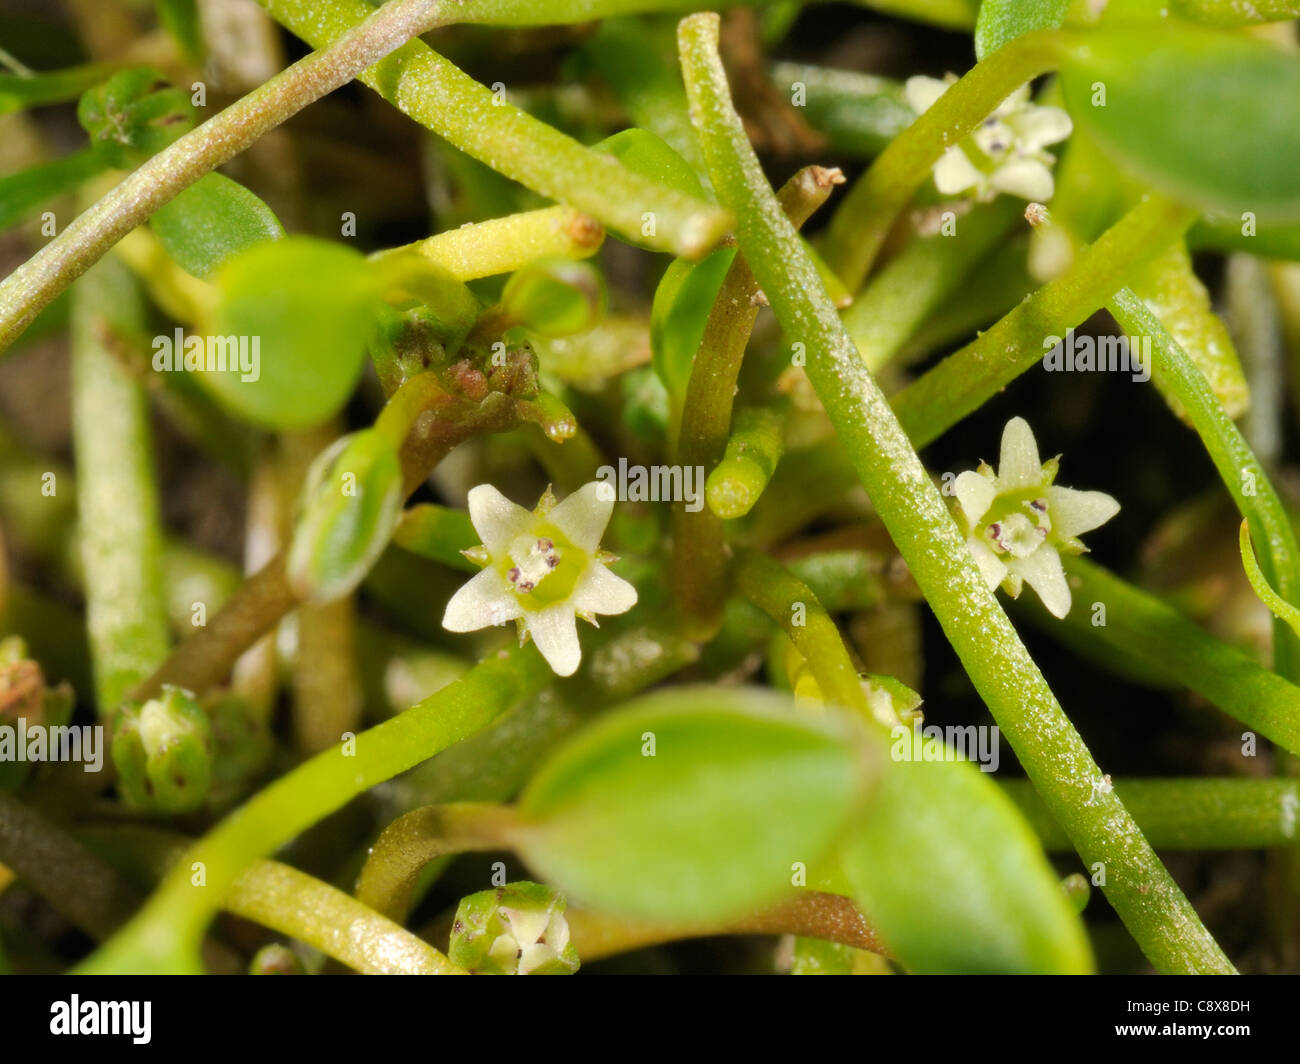 Mudwort, Limosella aquatica - Stock Image